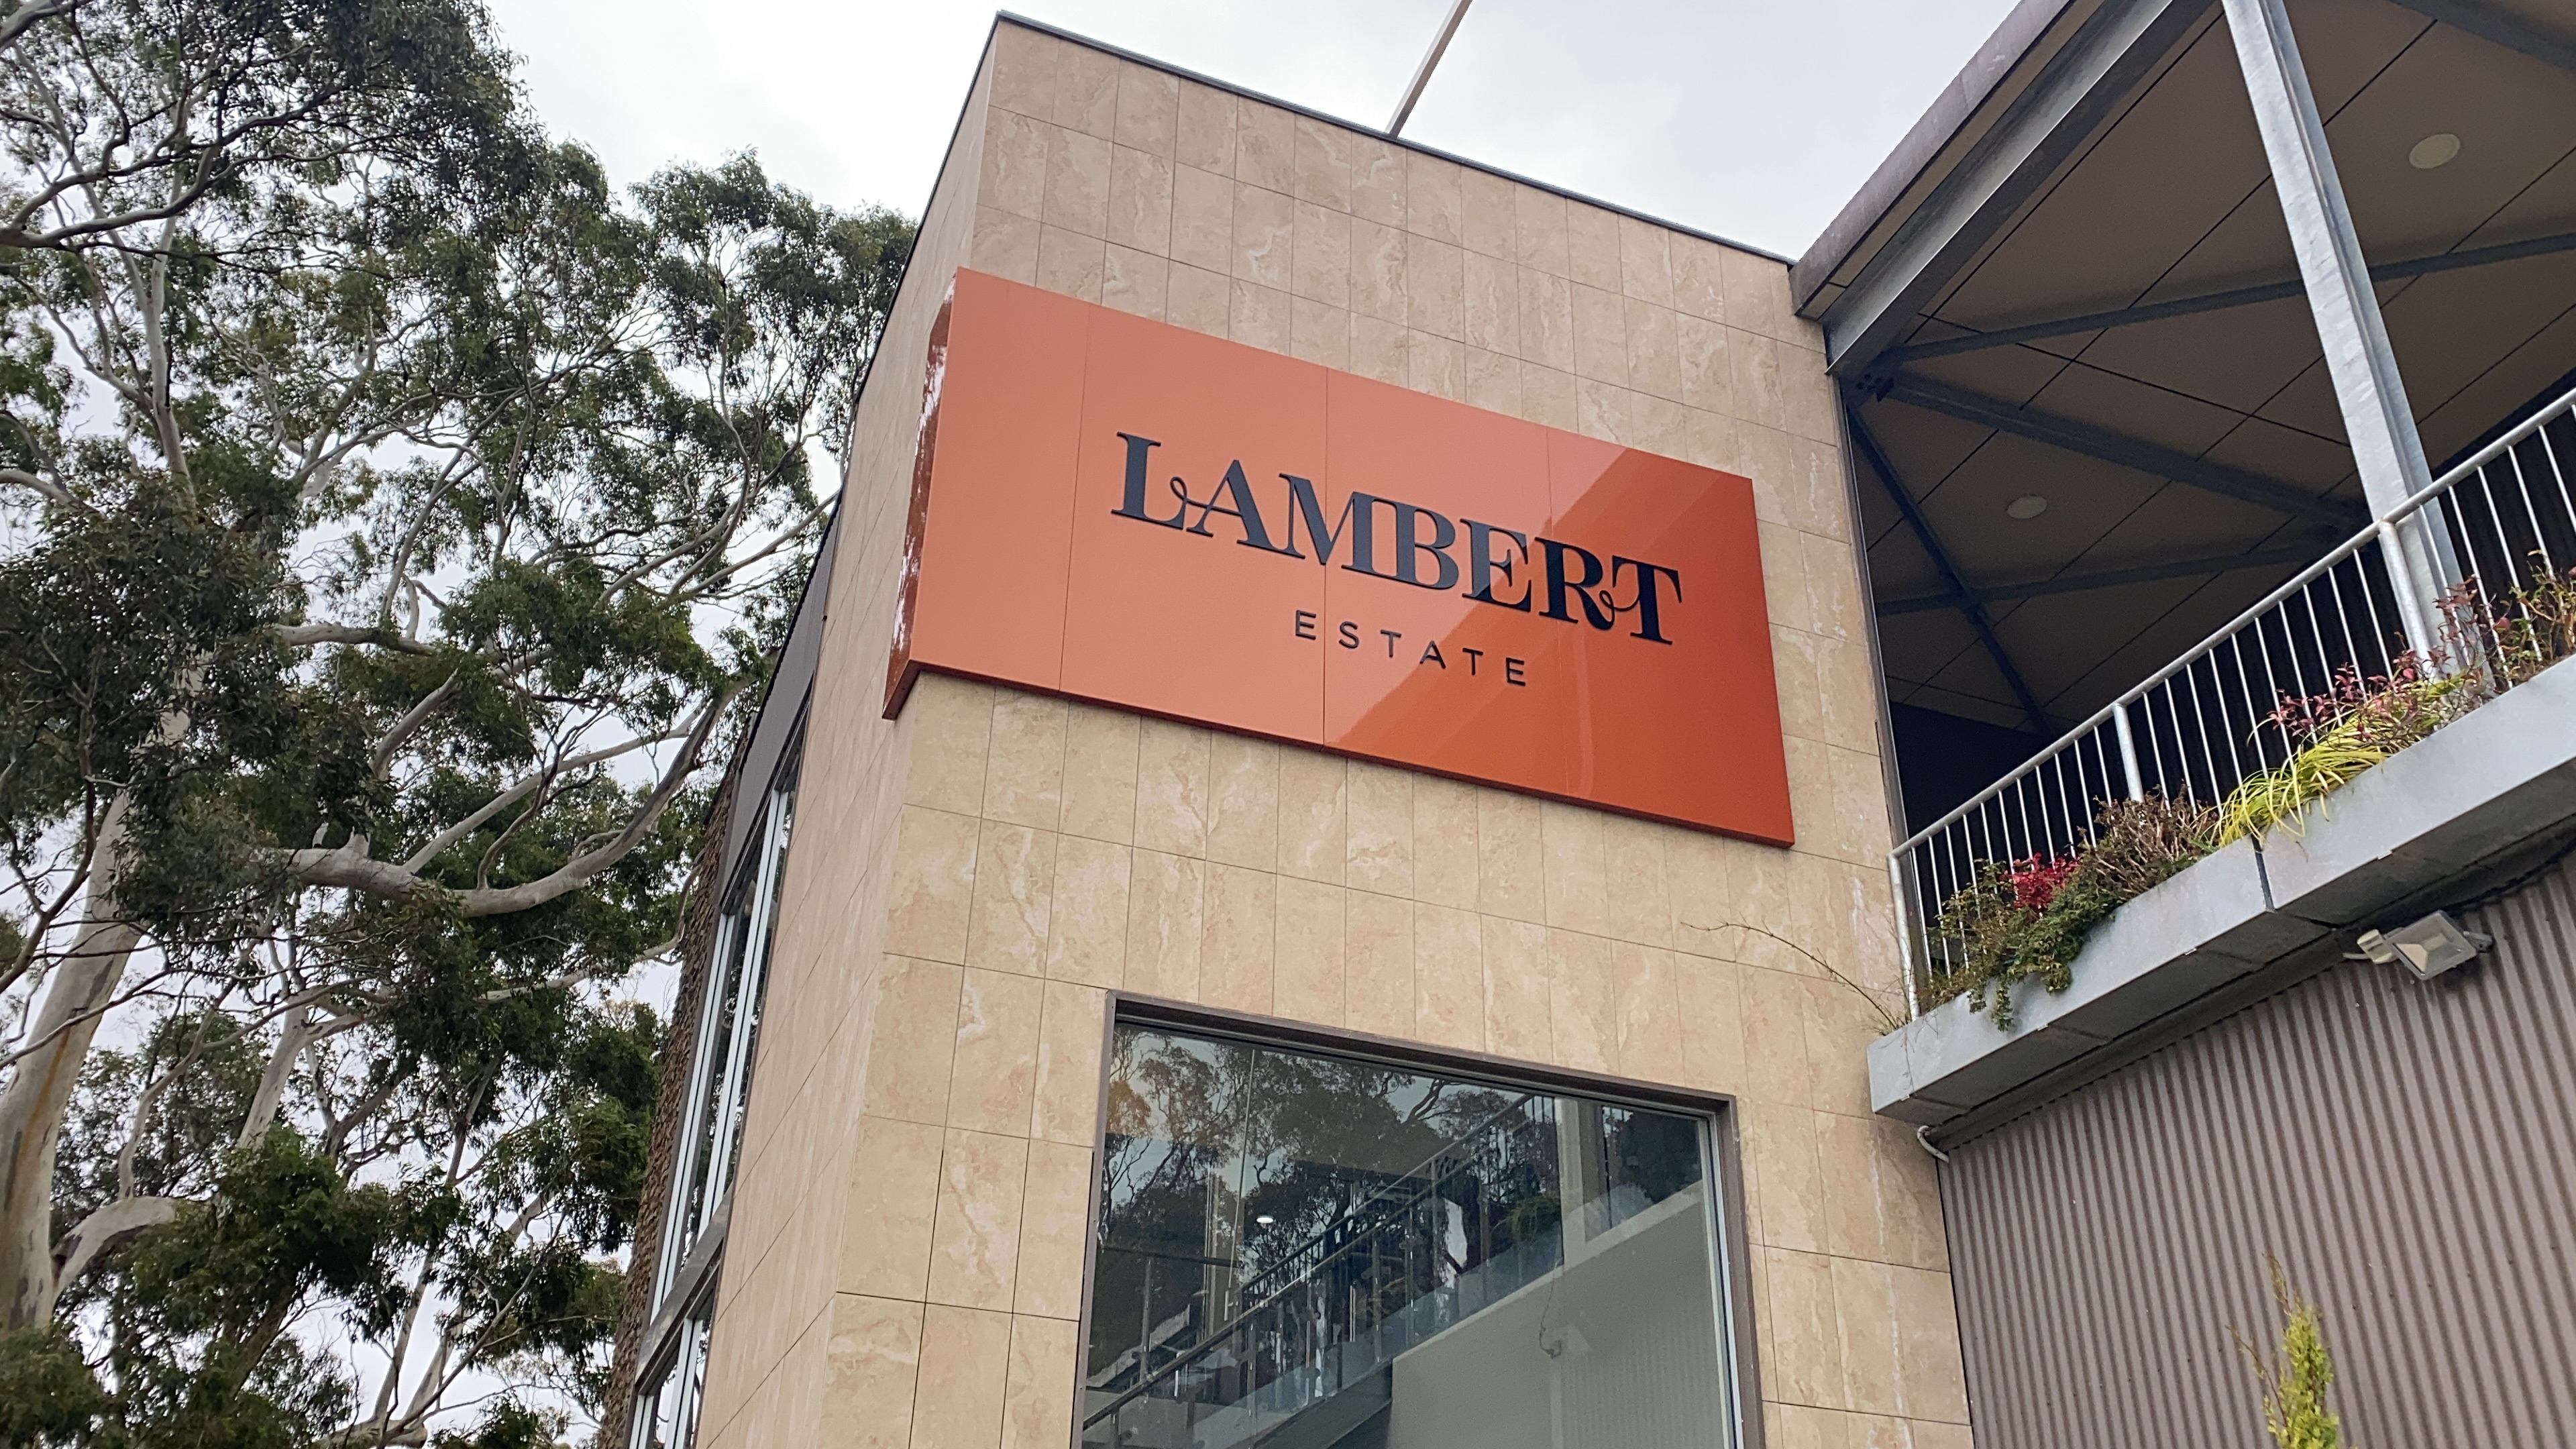 Lamber Estate Wines